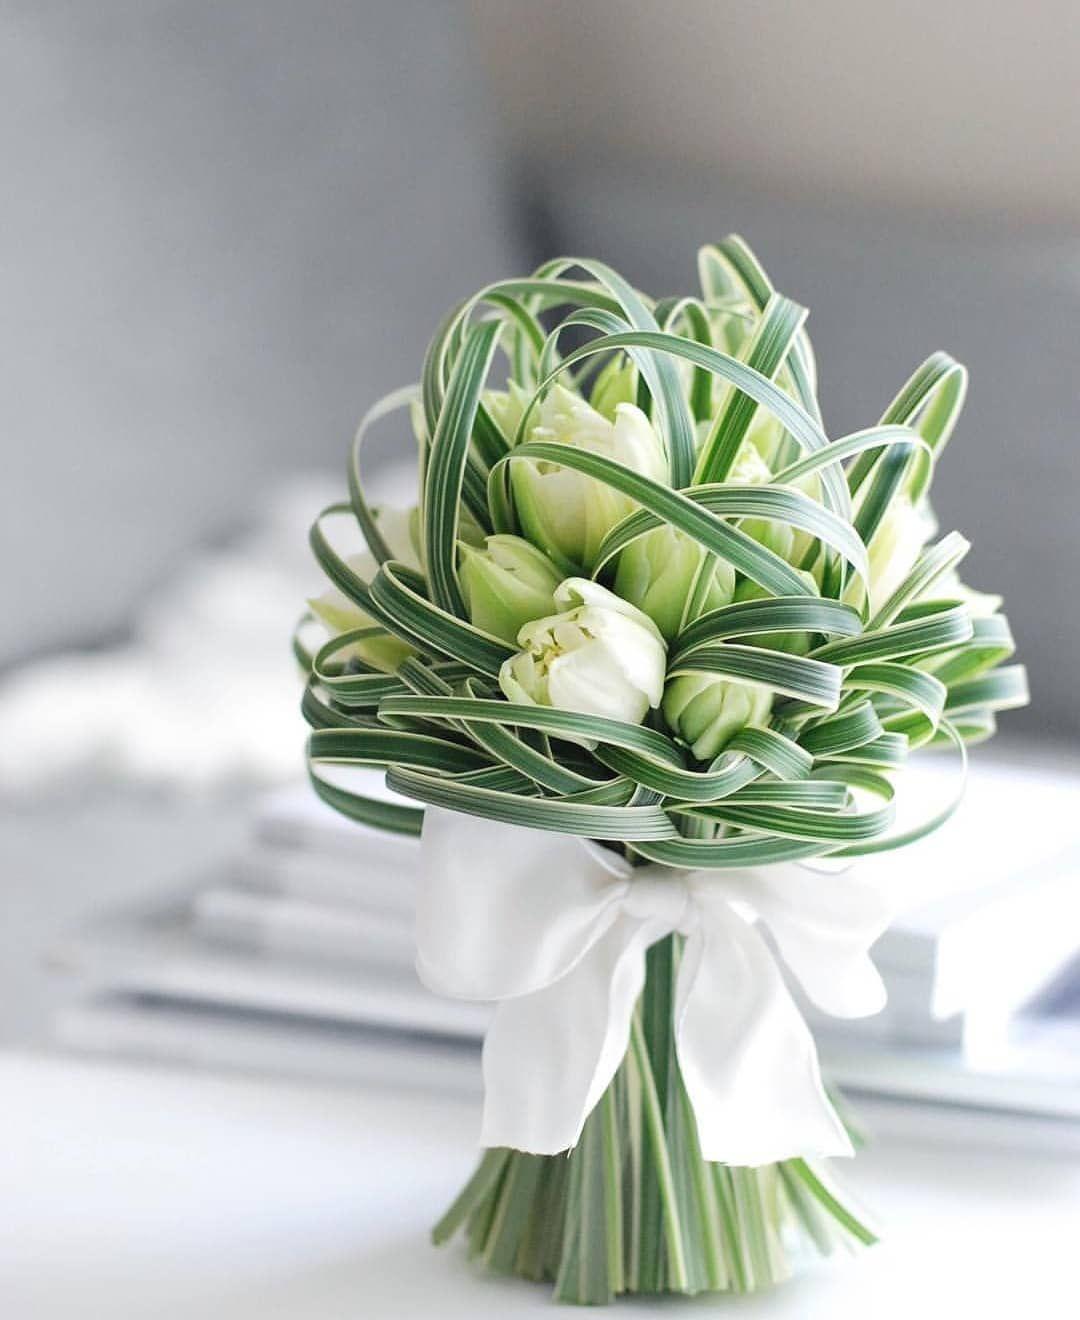 "Master Florist on Instagram: ""#FlorAmazing by @katsura_ishida flos #λουλούδια #λουλούδι #fleur #fleurs #blomme #blom #bloem #bloemen #bunga #bunga-bunga #цвијеће #цвет…"""